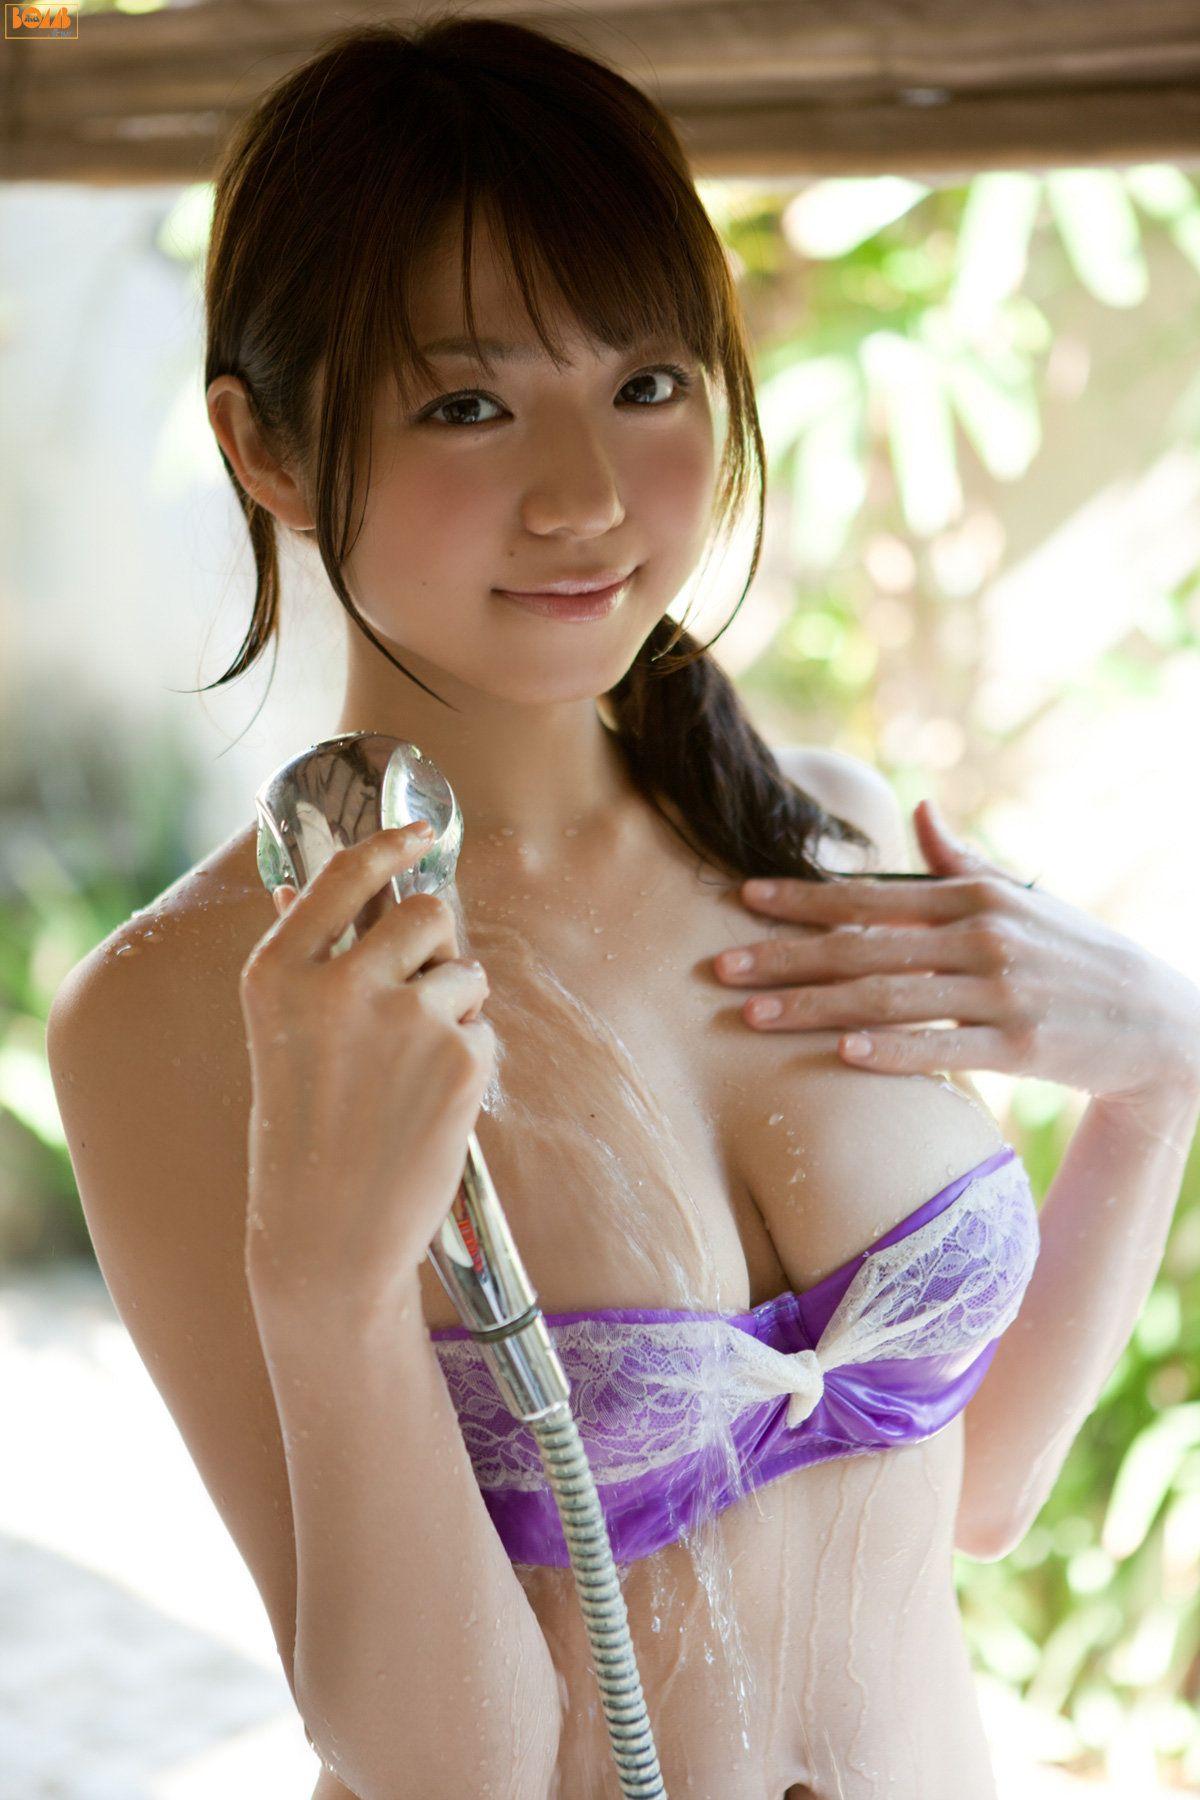 Japanese girl naked computer